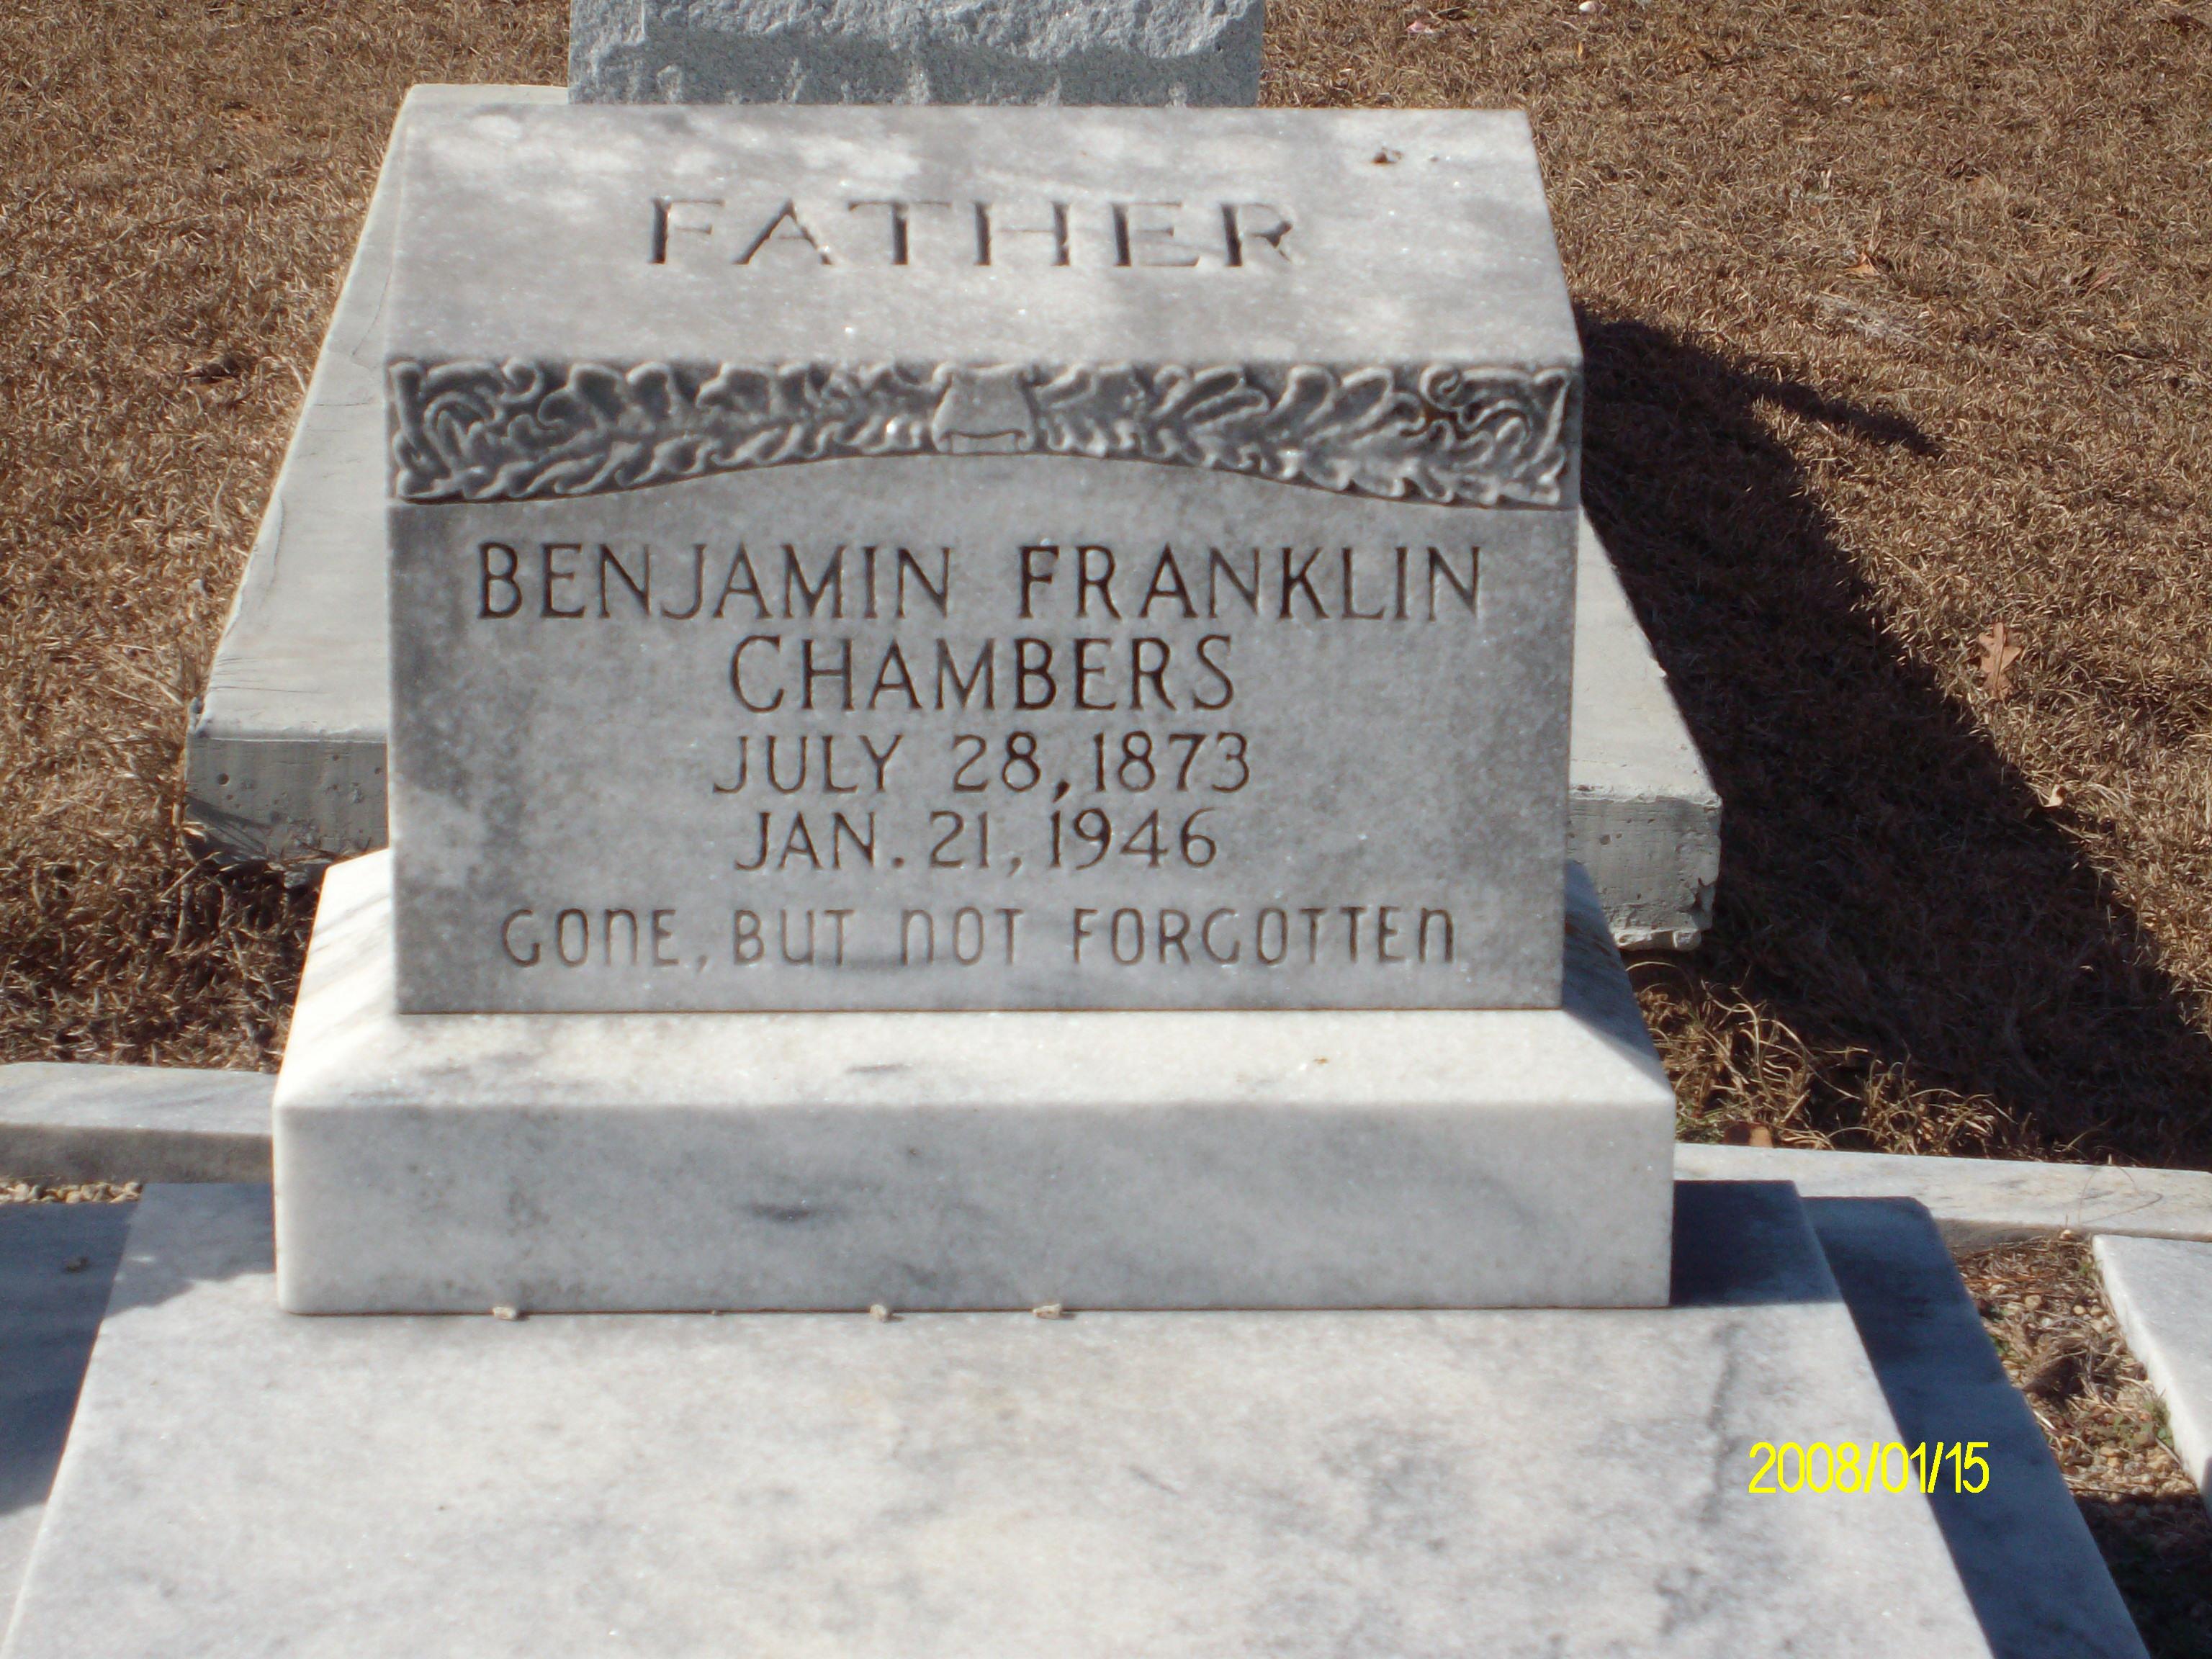 Benjamin Franklin Chambers